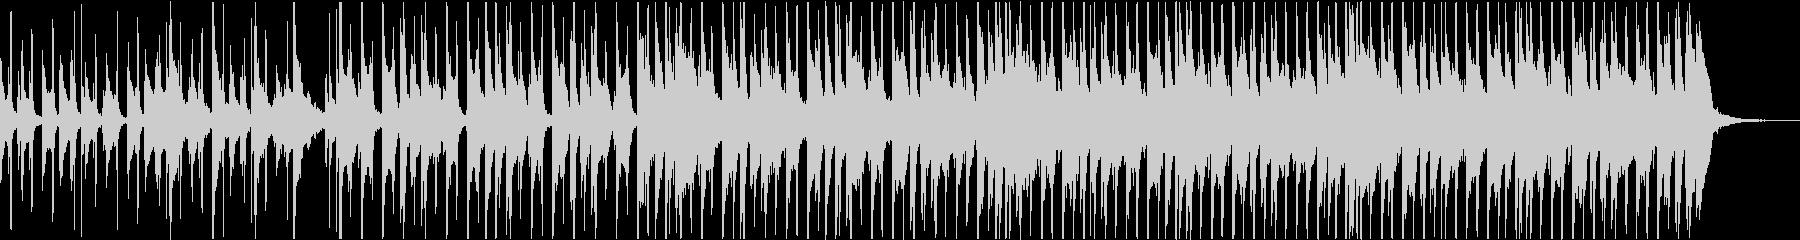 Happy Funny Joyful Fork's unreproduced waveform